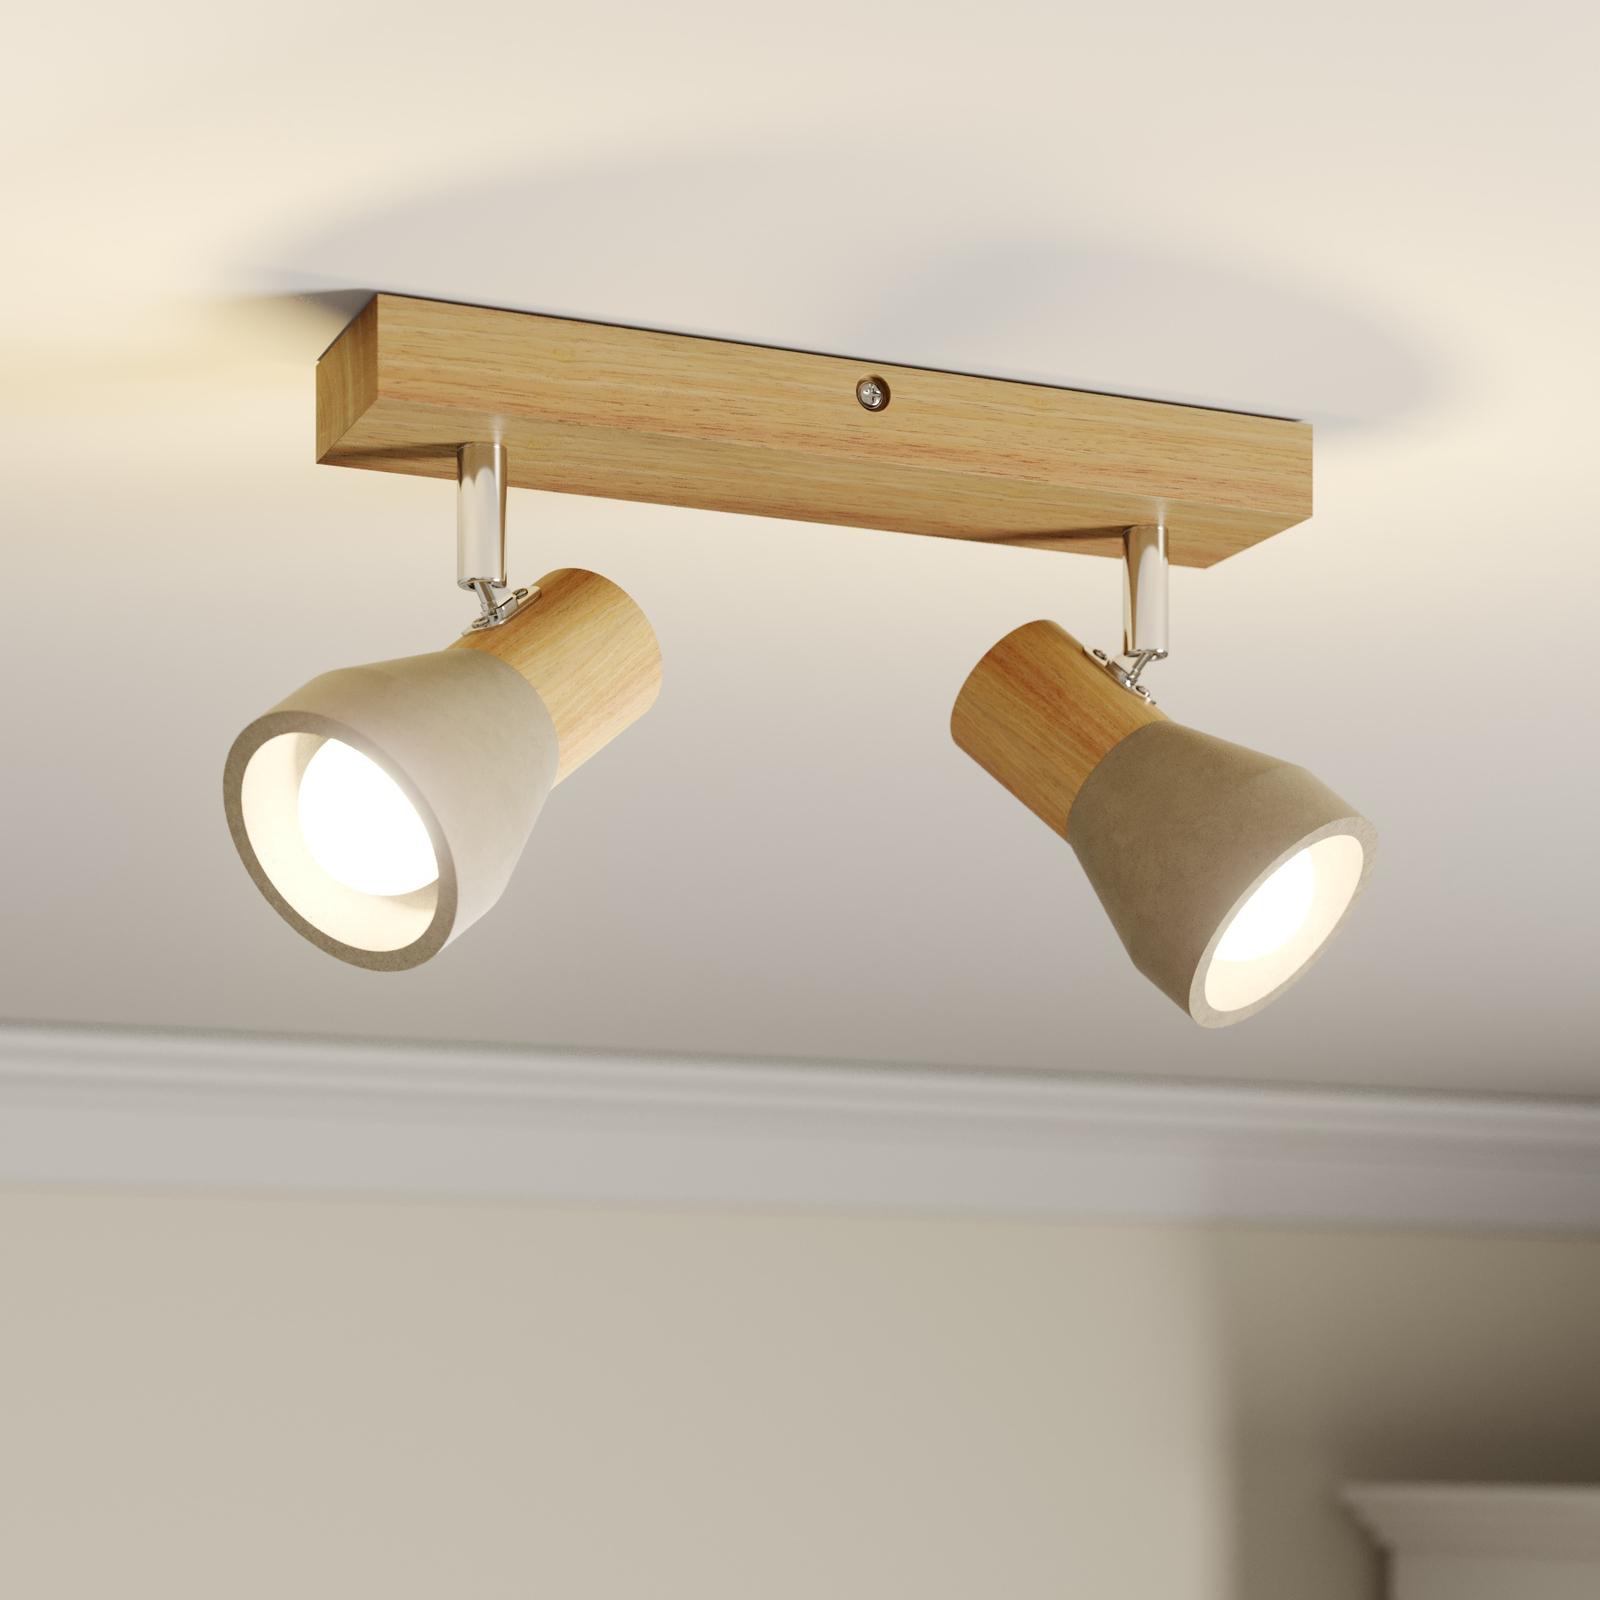 LED-Strahler Filiz aus Holz und Beton, 2-flammig